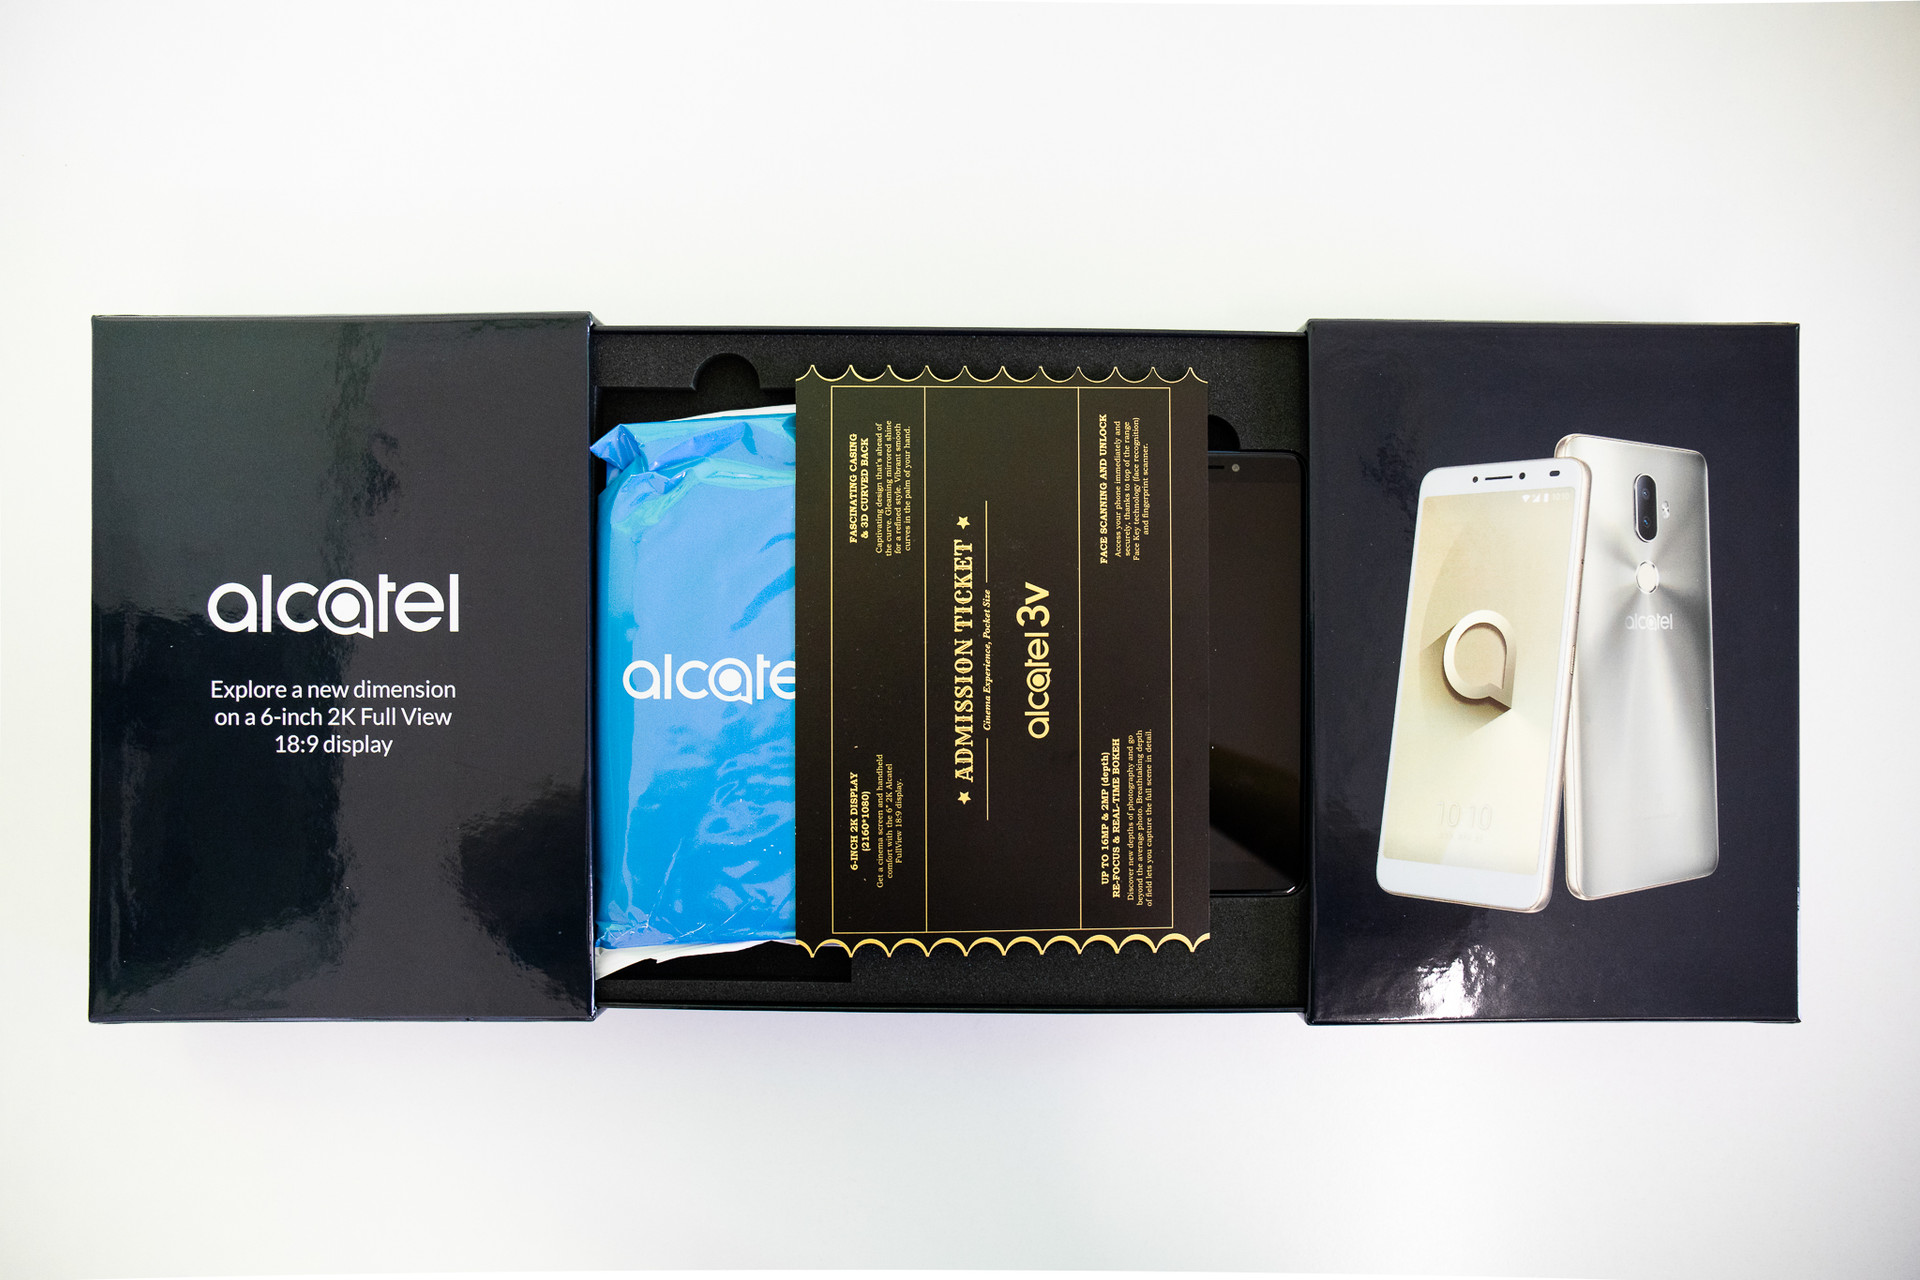 Alcatel Gifting